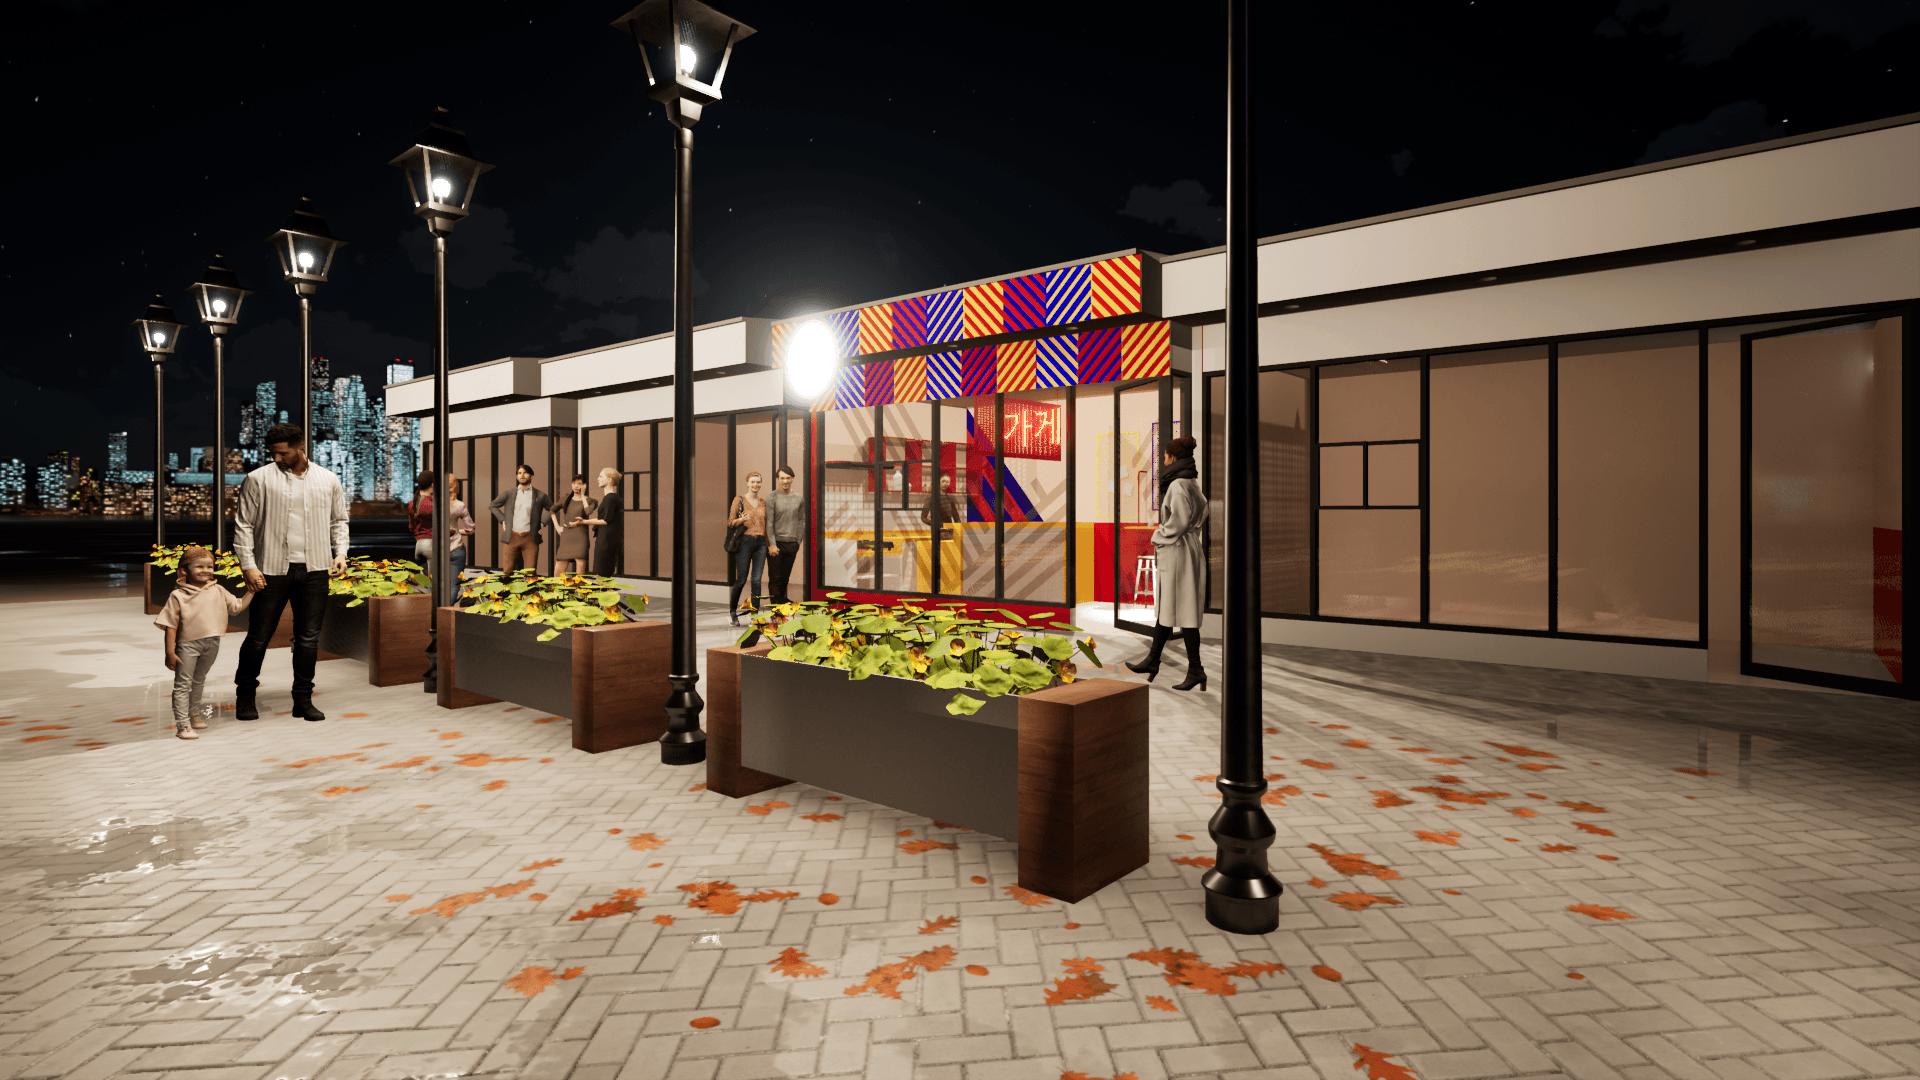 Arsiyasta Studio Korean Food Stall - Kedai Makanan Korea Surabaya, Kota Sby, Jawa Timur, Indonesia Surabaya, Kota Sby, Jawa Timur, Indonesia Arsiyasta-Studio-Korean-Food-Stall-Kedai-Makanan-Korea  115863